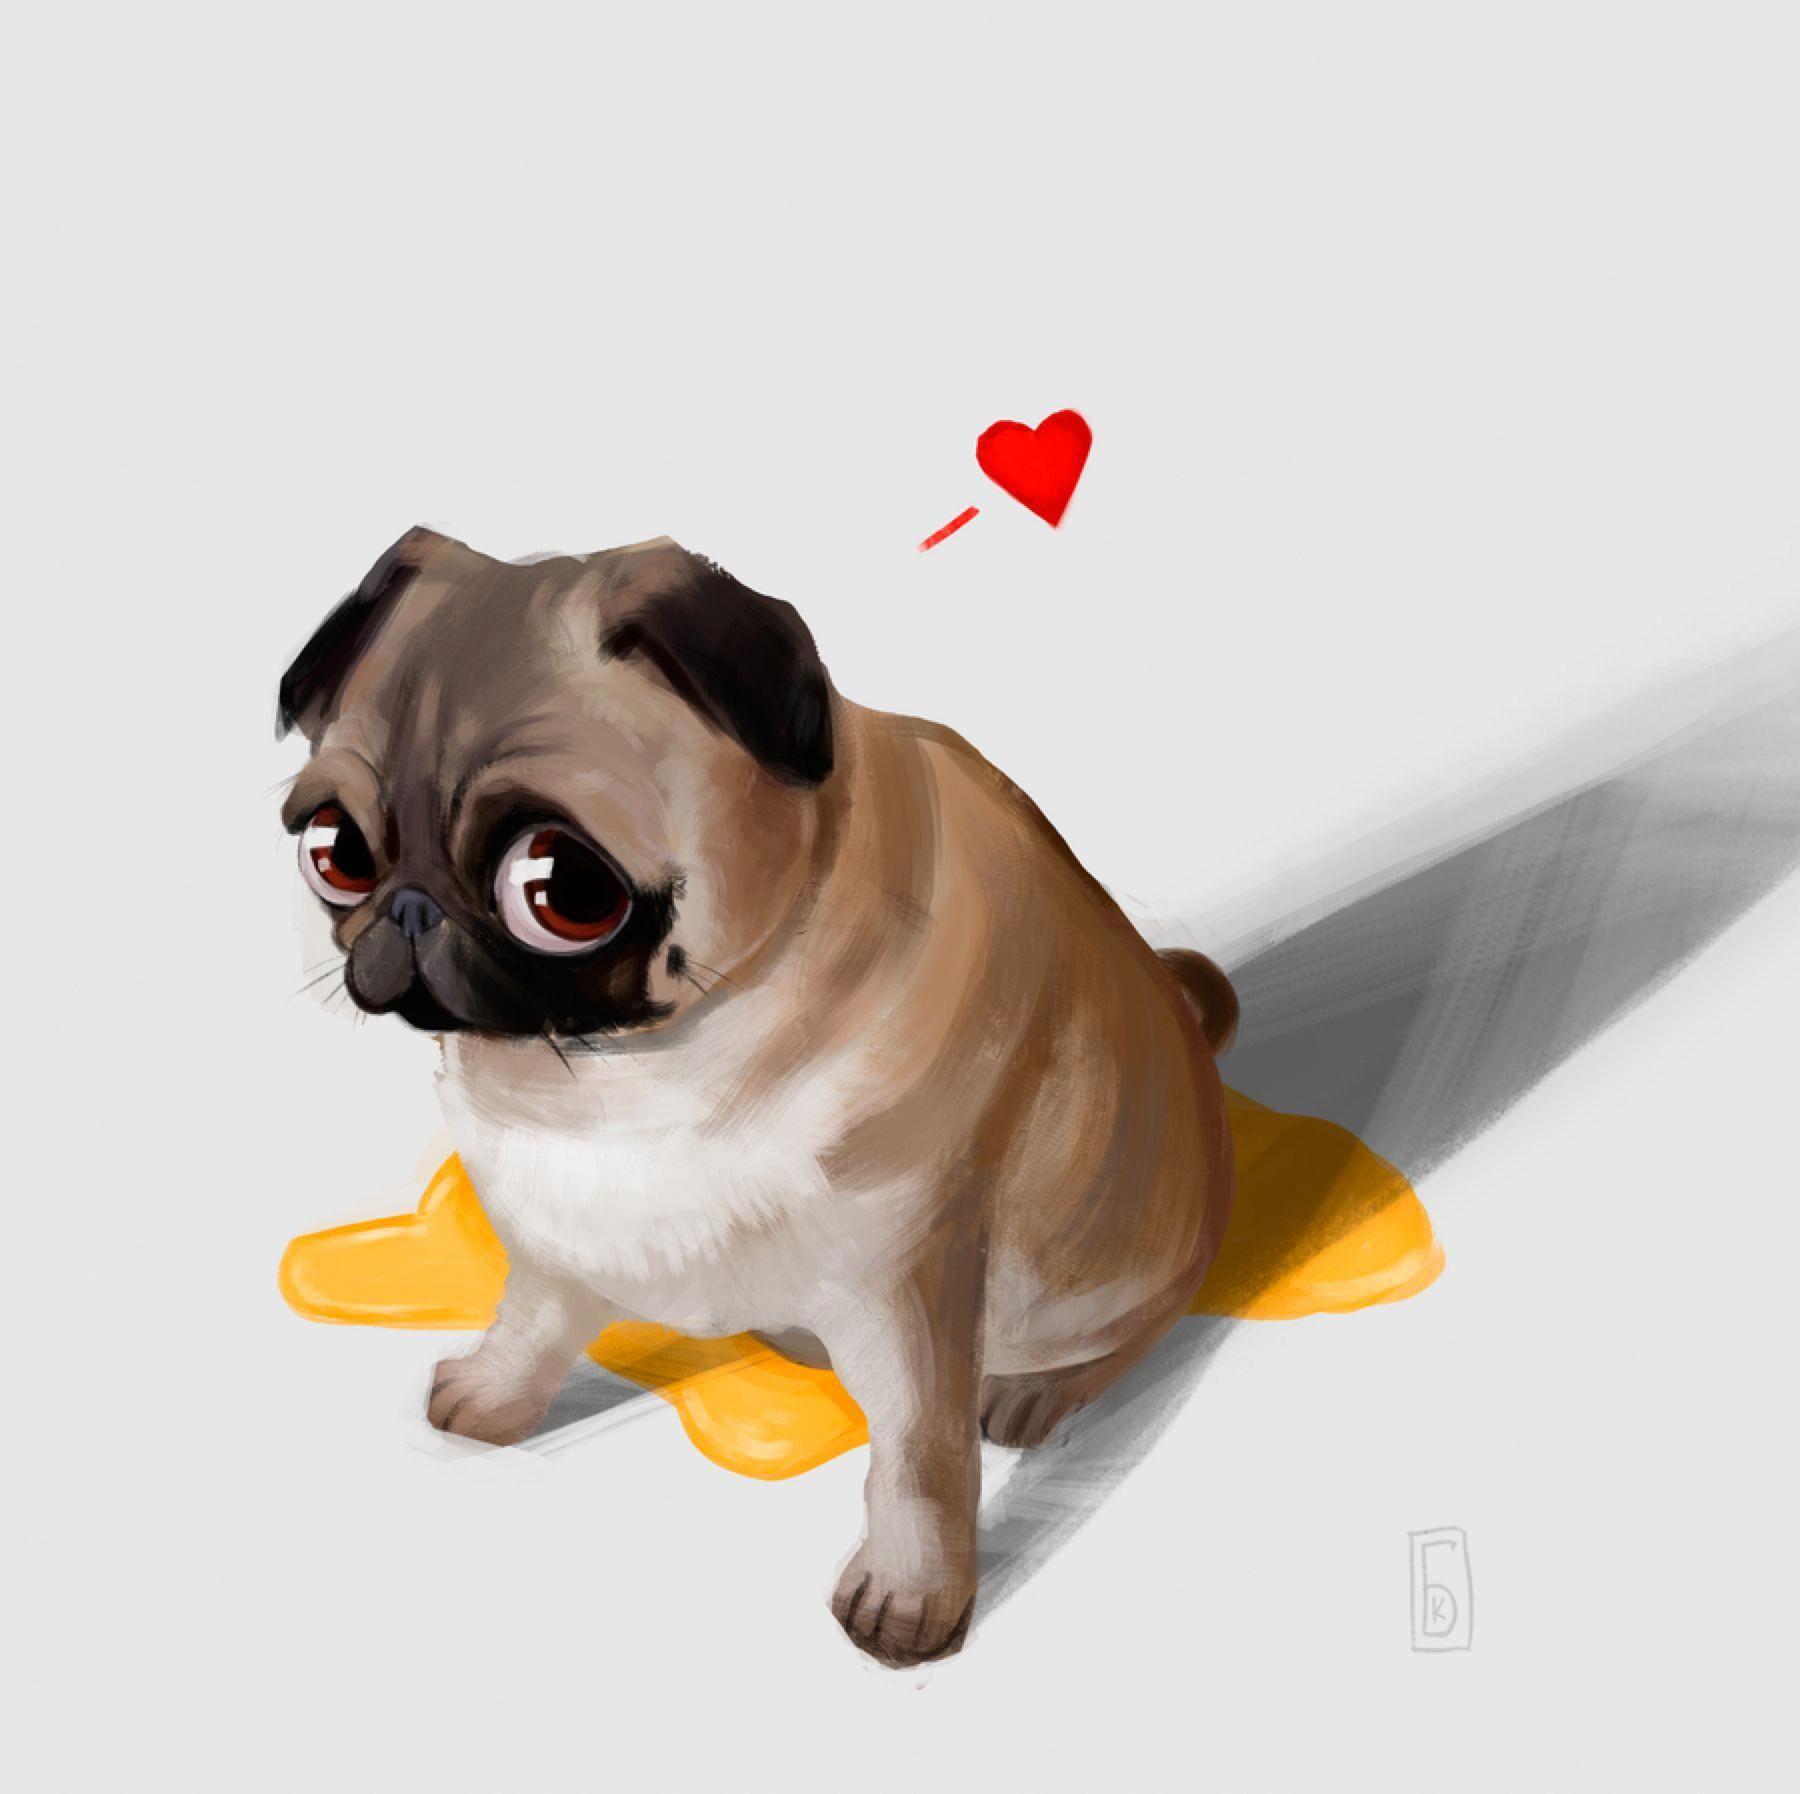 Bff S Baby Pugs Pugs Cute Pugs